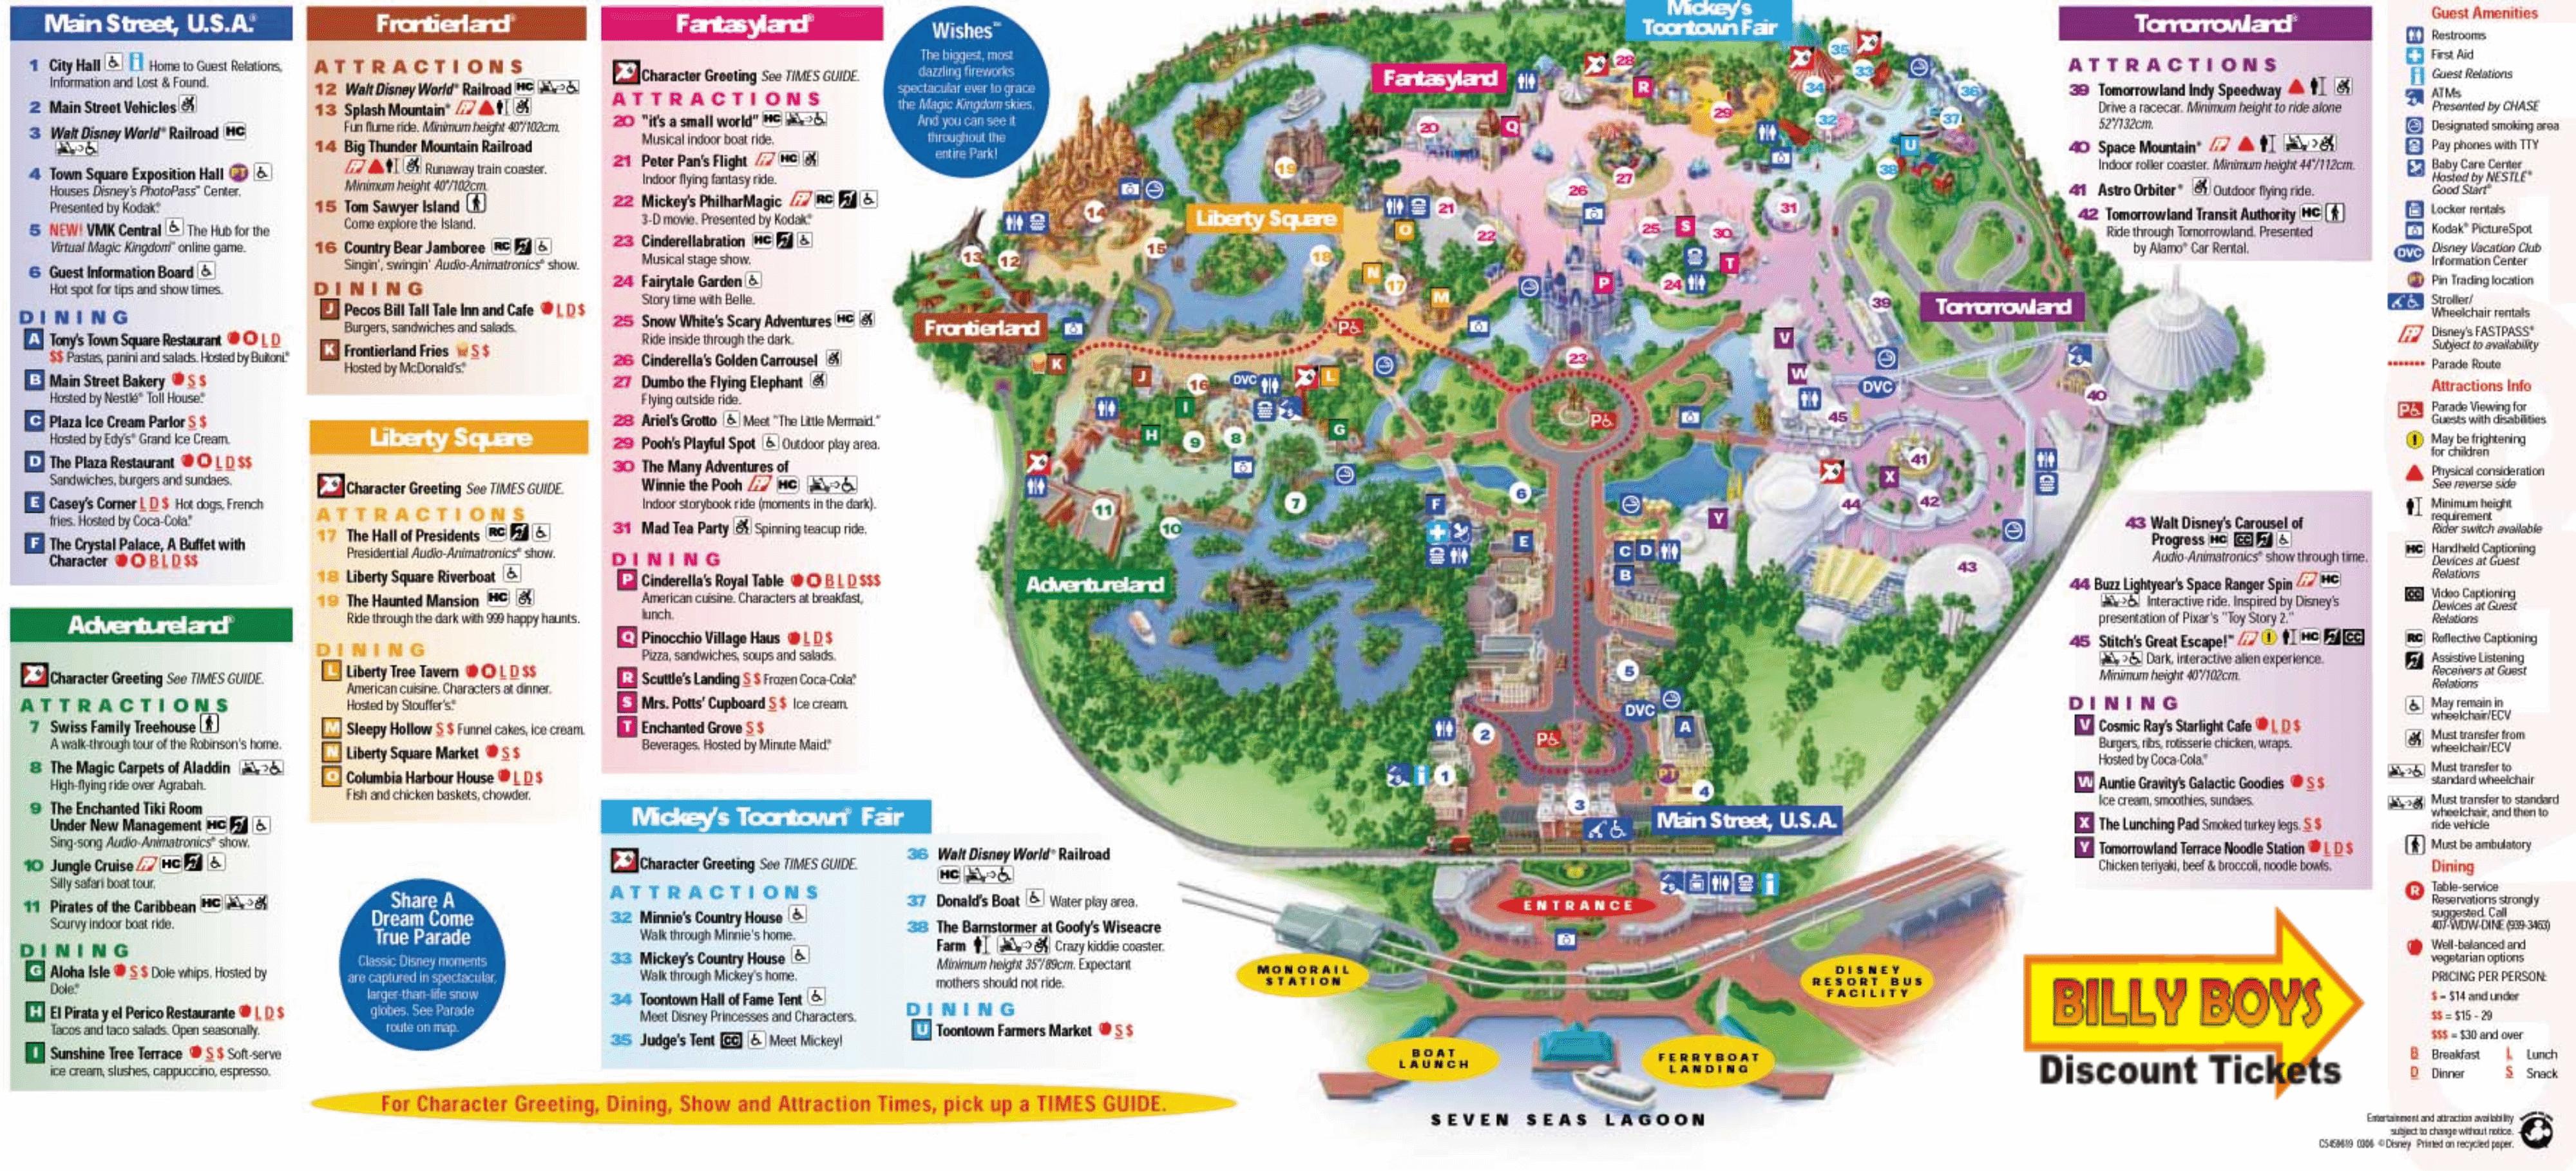 Disney World Florida Map From Ambergontrail 3 - Judecelestin2010 - Disney World Florida Map 2018